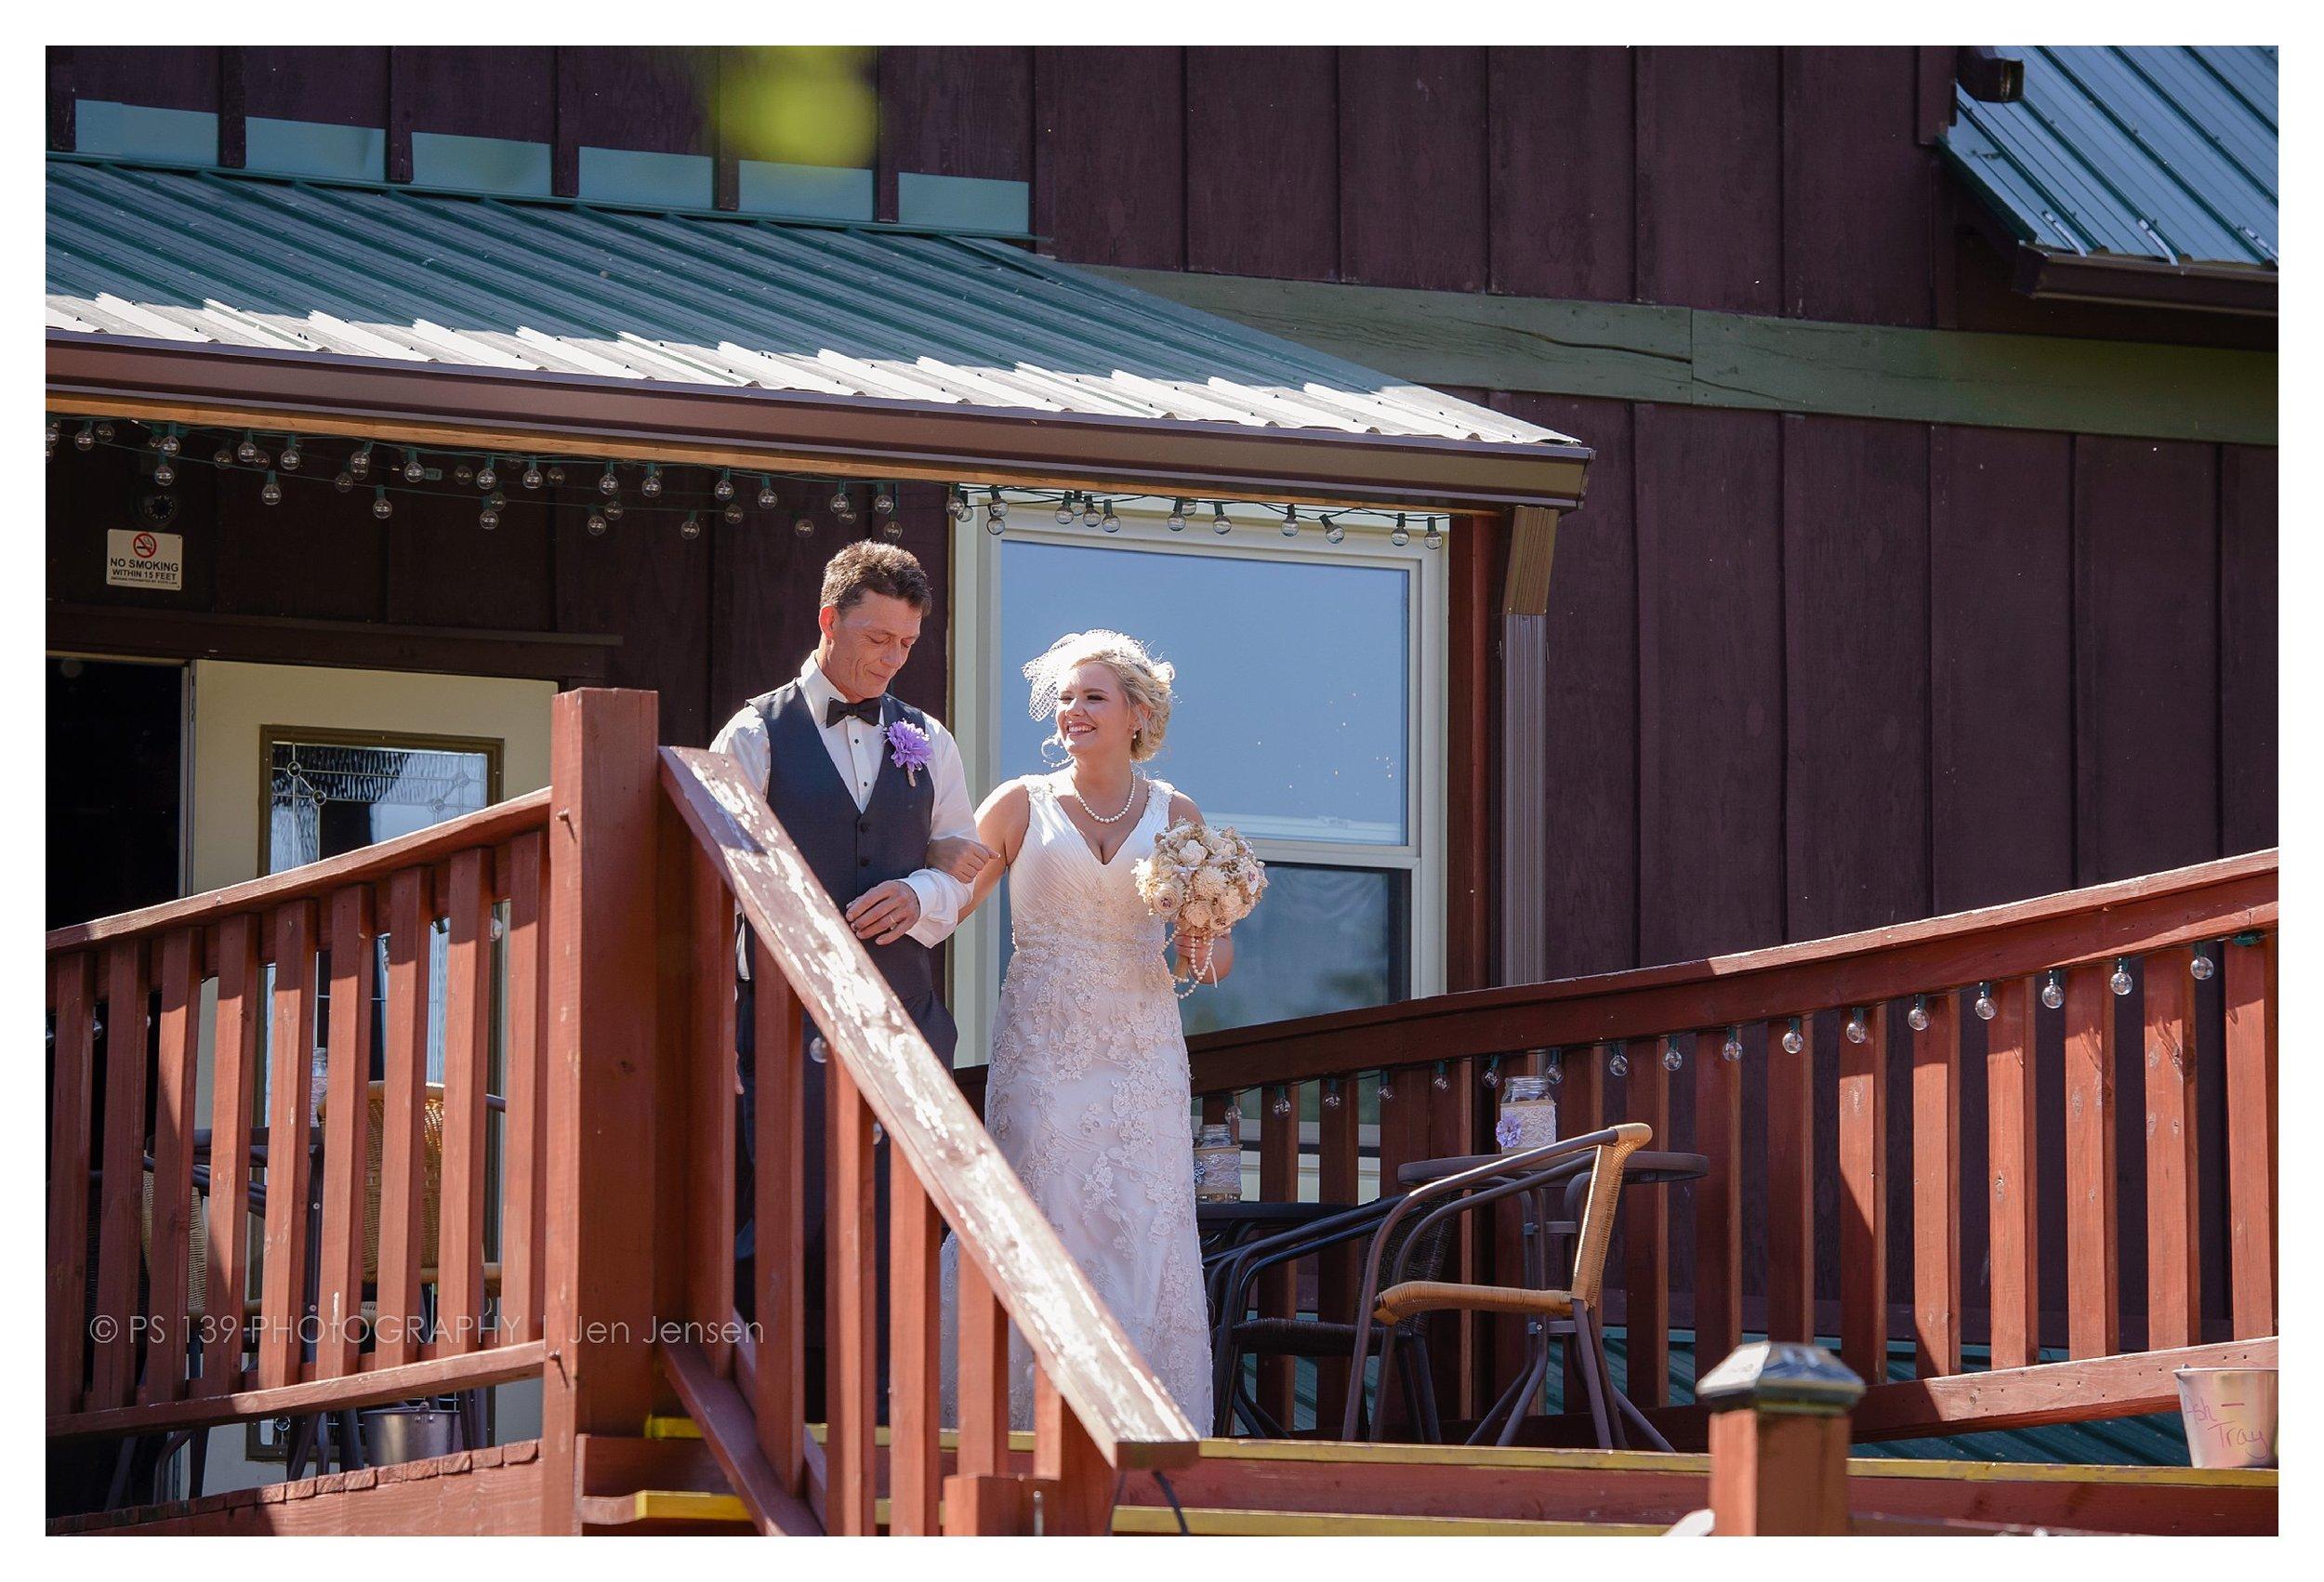 oregon Illinois oak lane farm wisconsin wedding photographer bayfield wi ps 139 photography jen jensen_0260.jpg